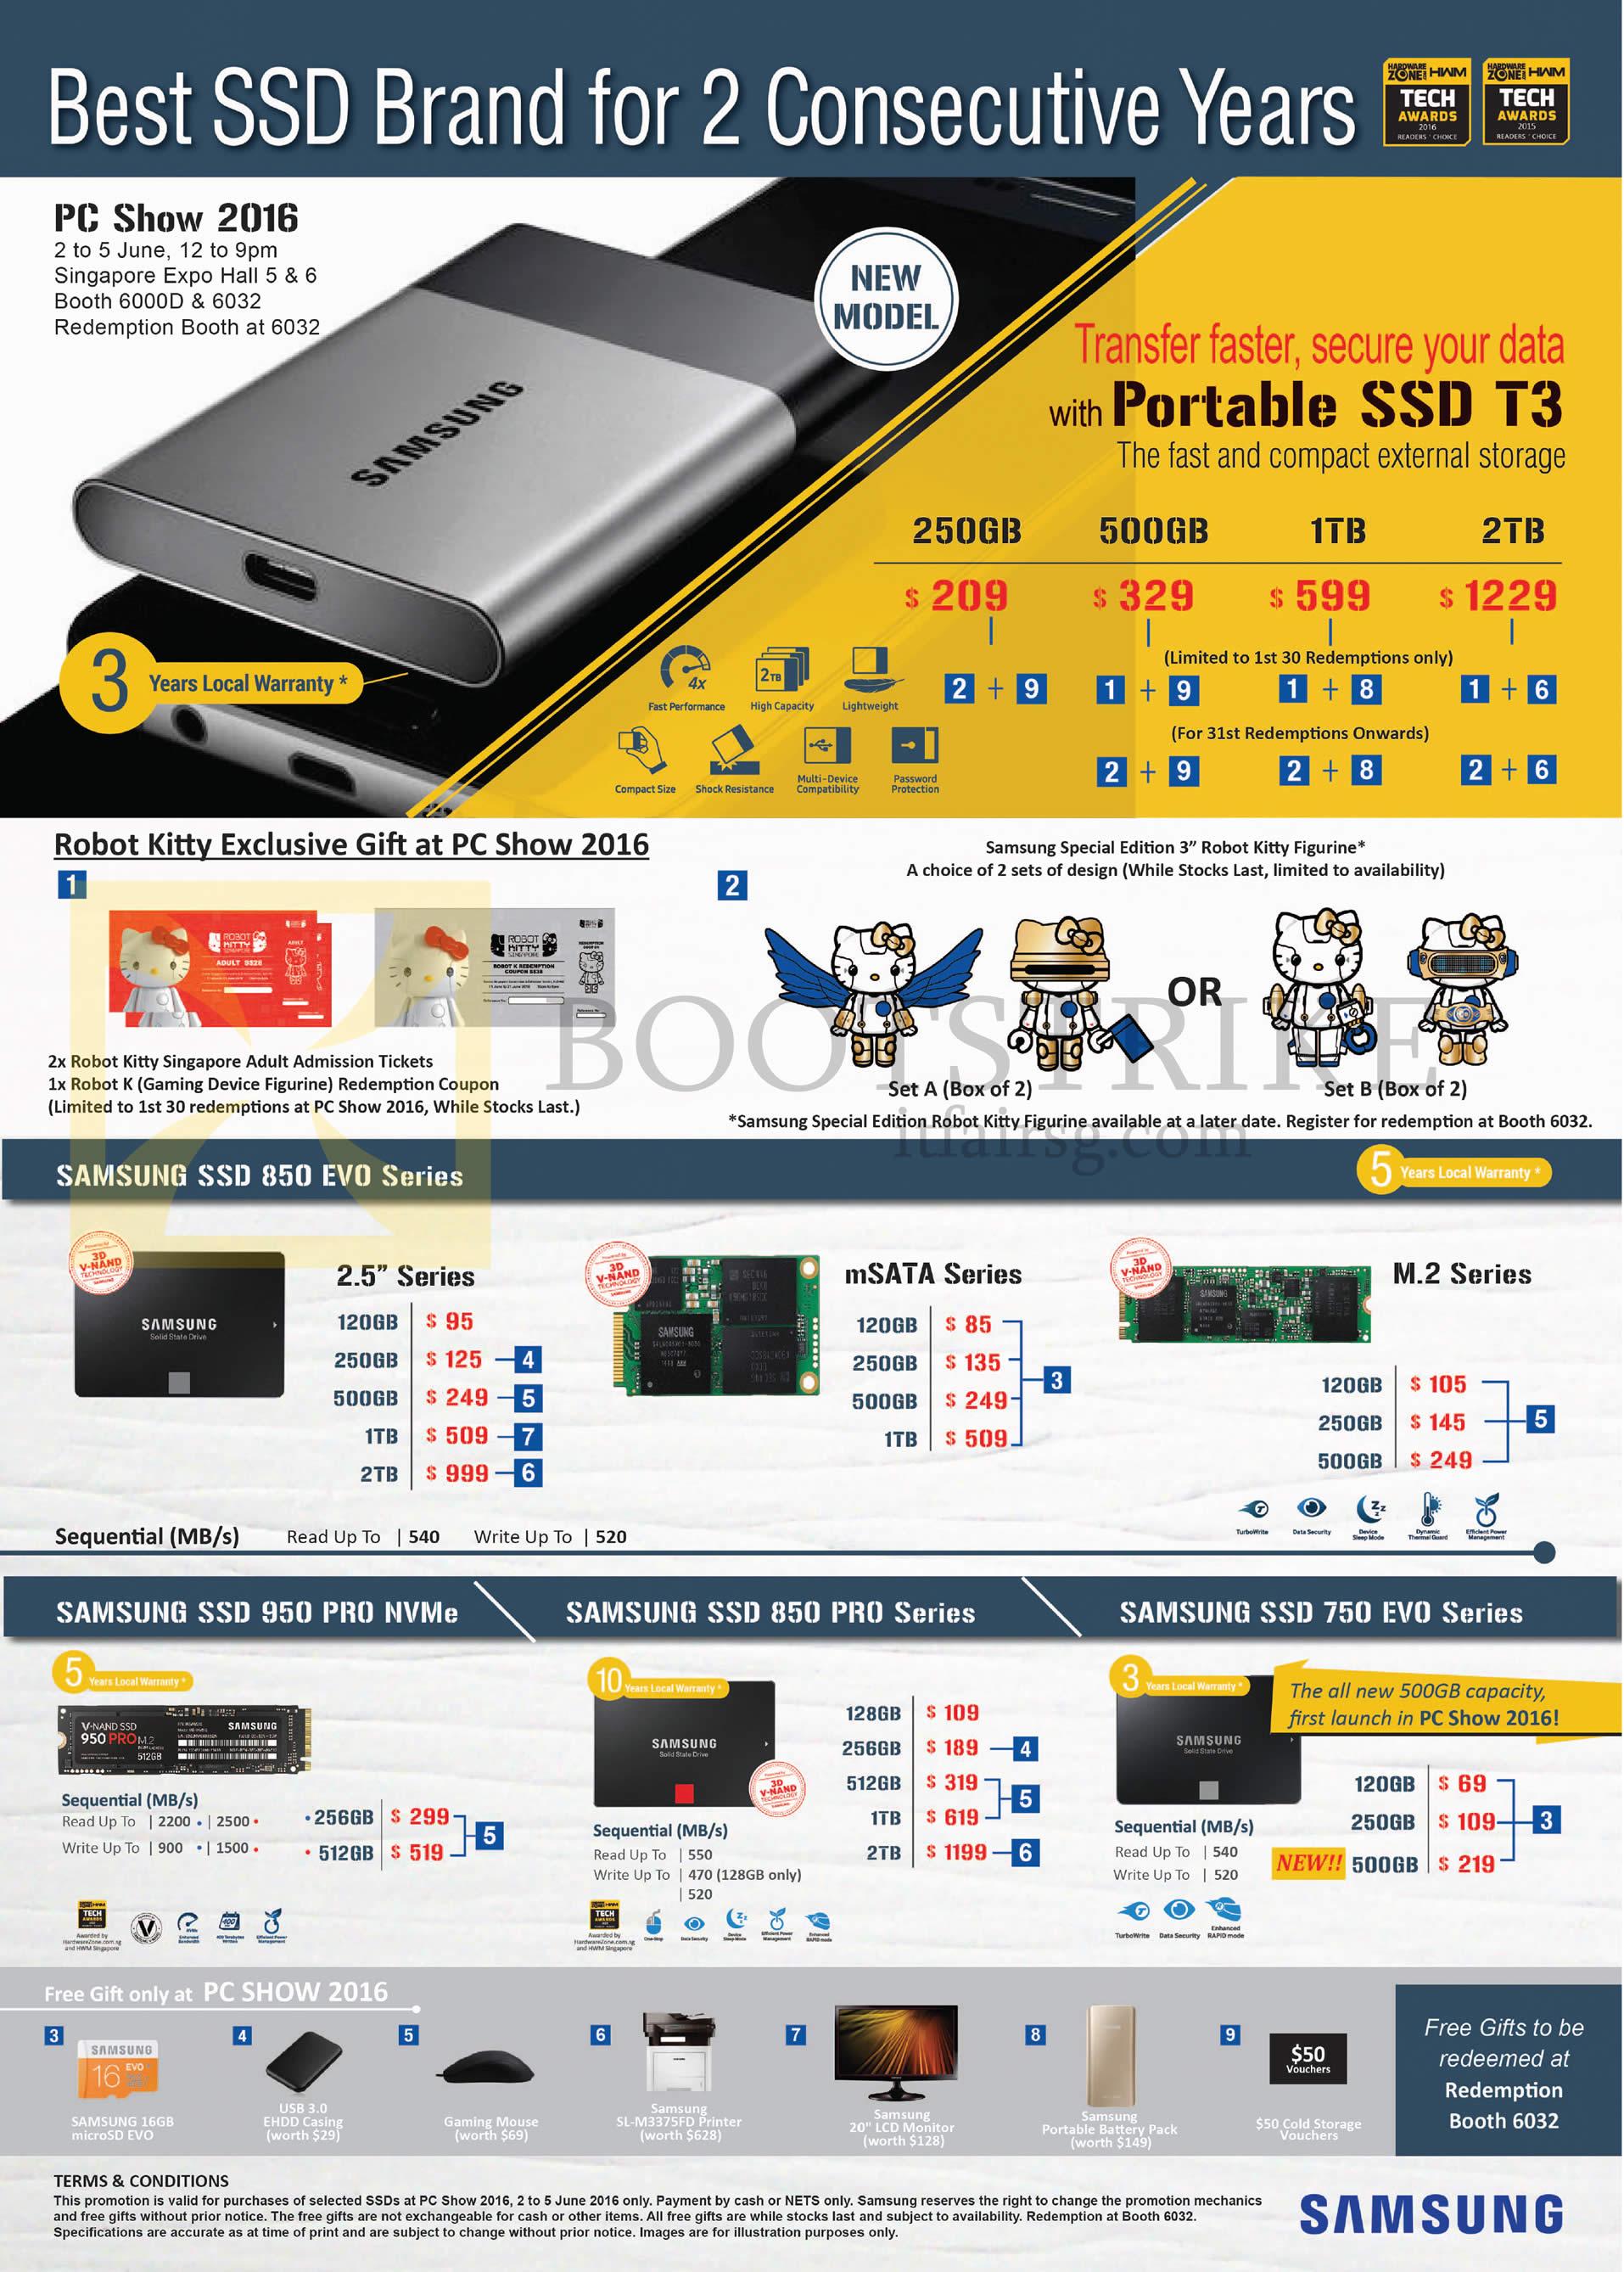 PC SHOW 2016 price list image brochure of Samsung SSDs Storage, Robot Kitty, T3 Portable, 850 Evo, 950 Pro NVMe, 850 Pro, 750 Evo Series, 120GB, 250GB, 500GB, 256GB, 512GB, 1TB, 2TB